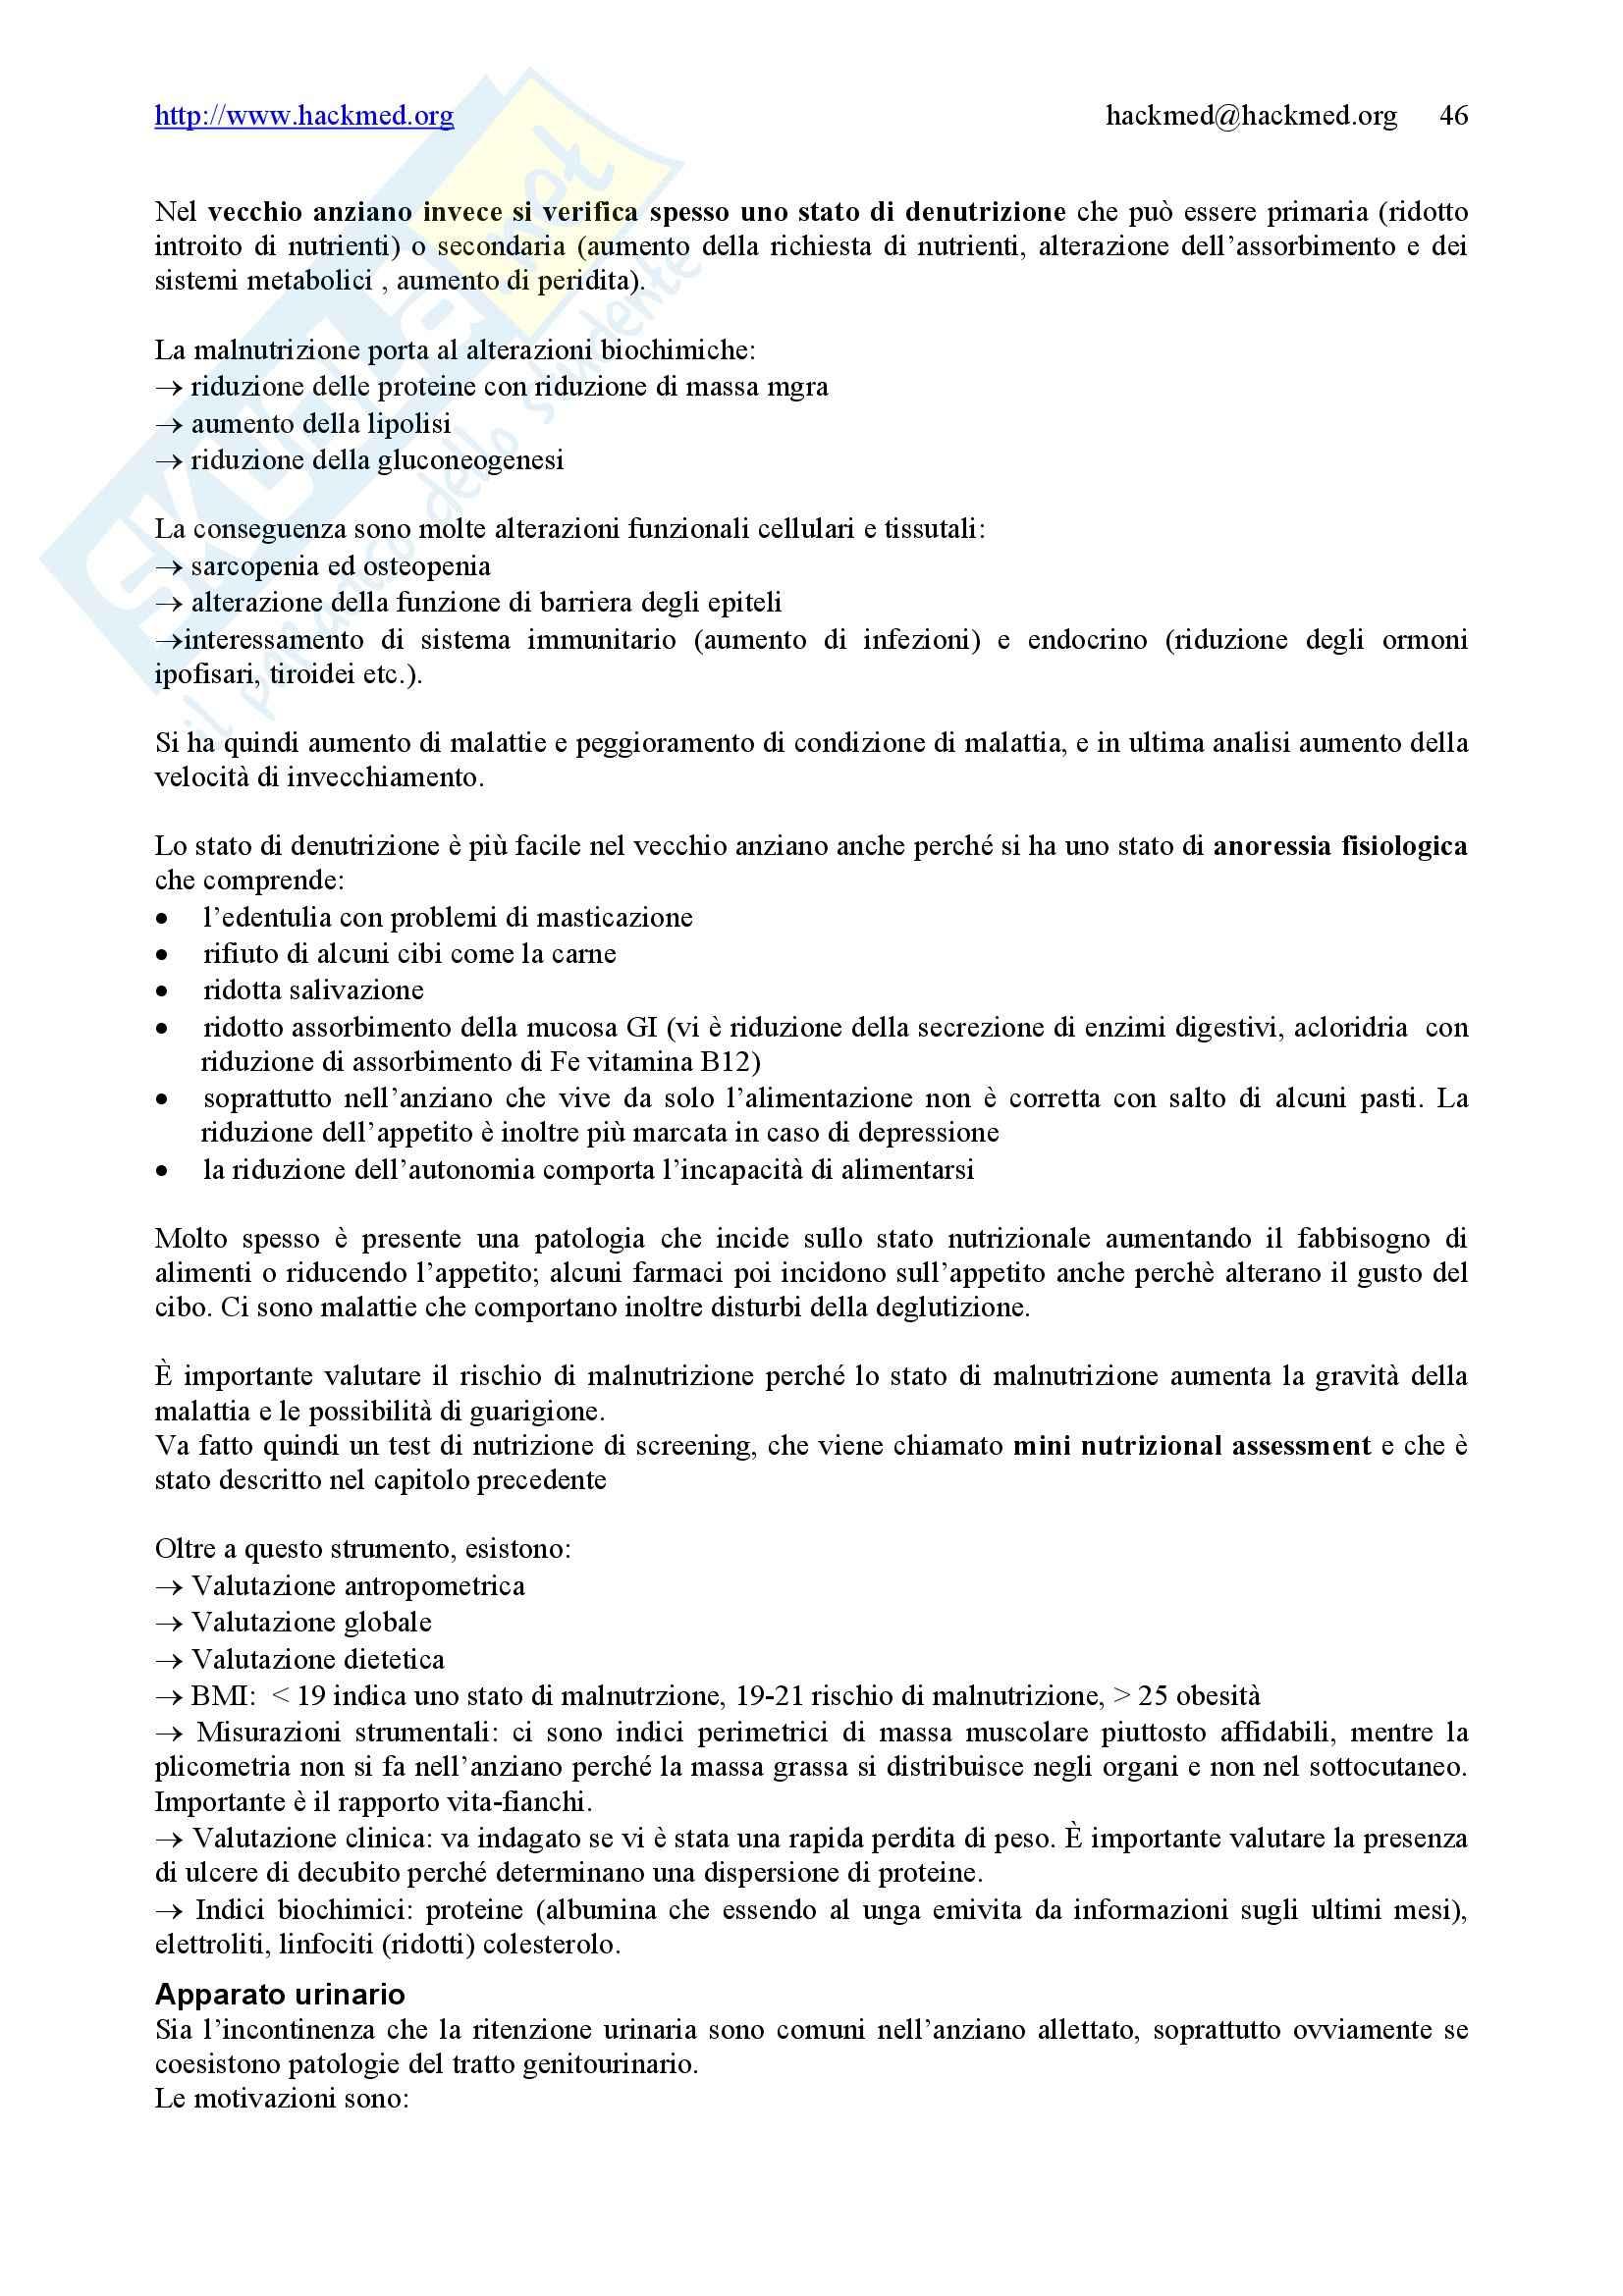 Geriatria - Nozioni generali Pag. 46